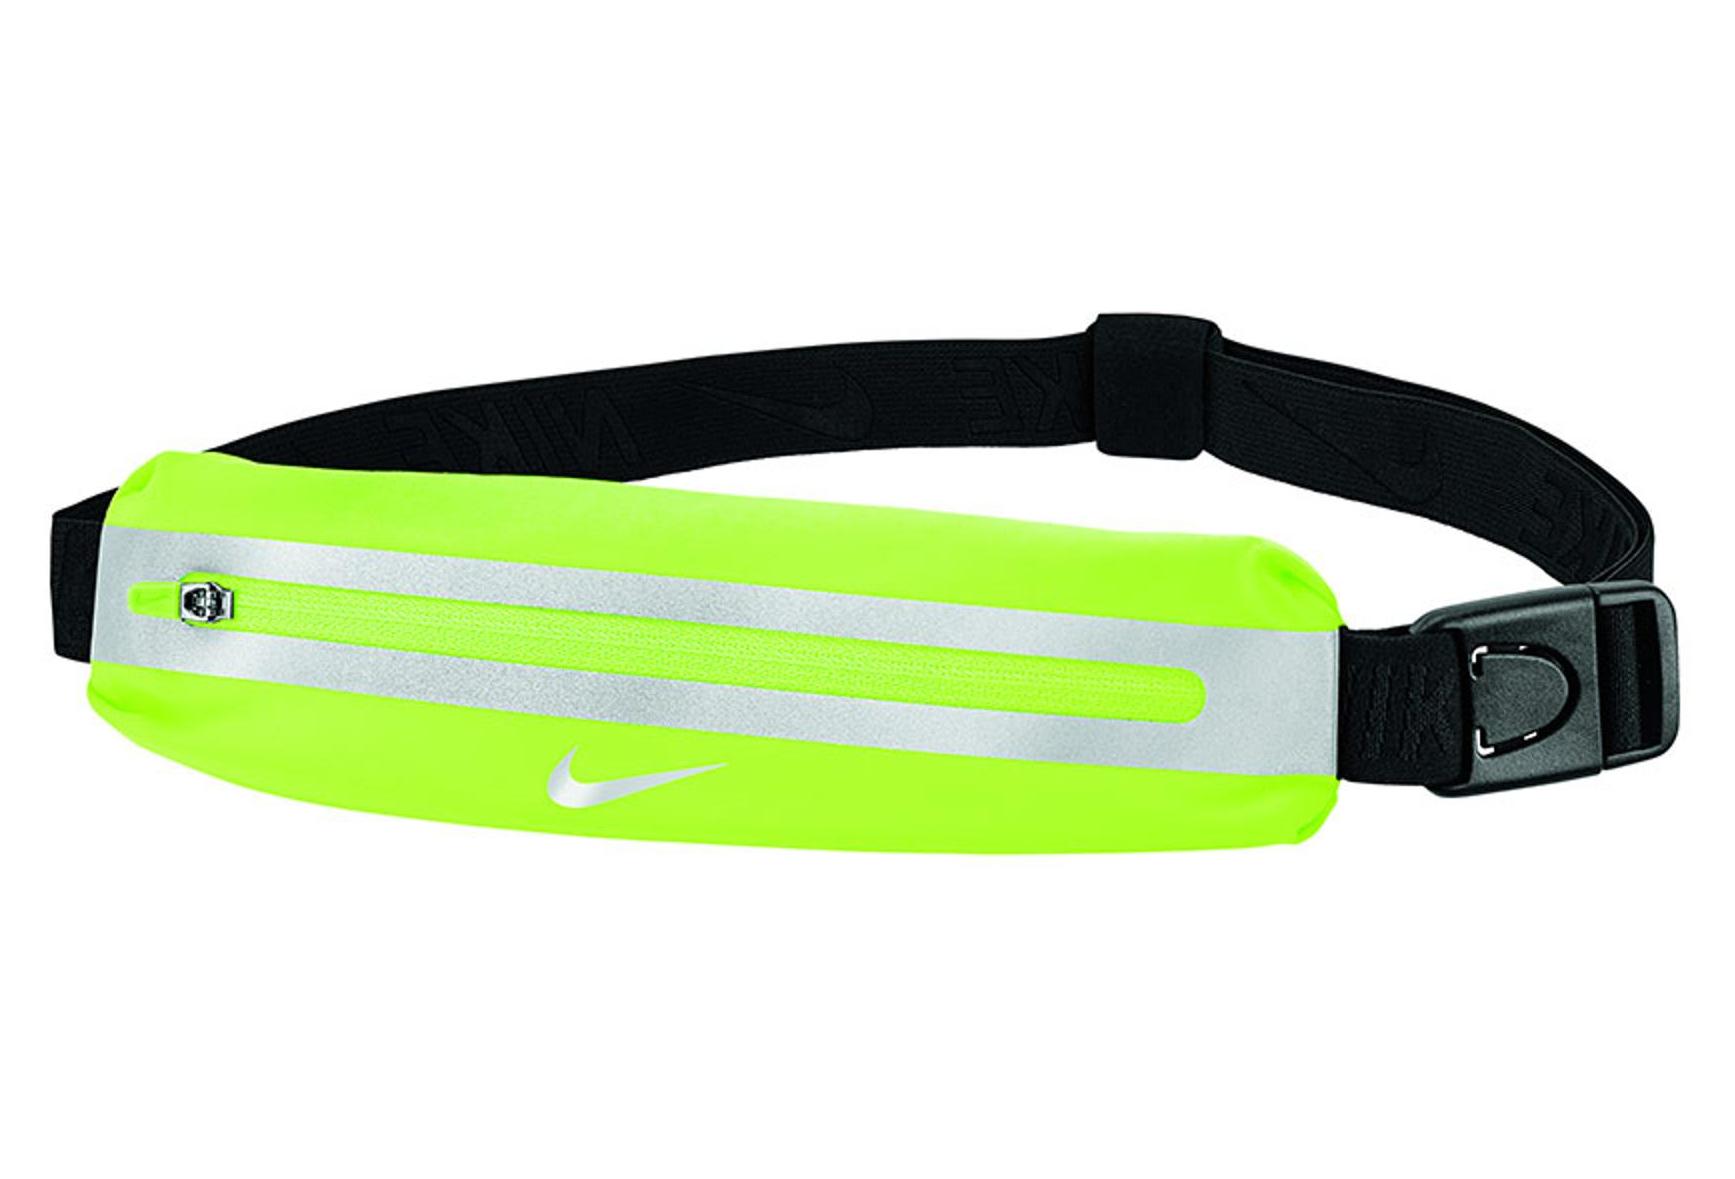 Black Sports Running Lightweight Pockets Compressport Unisex Free Belt